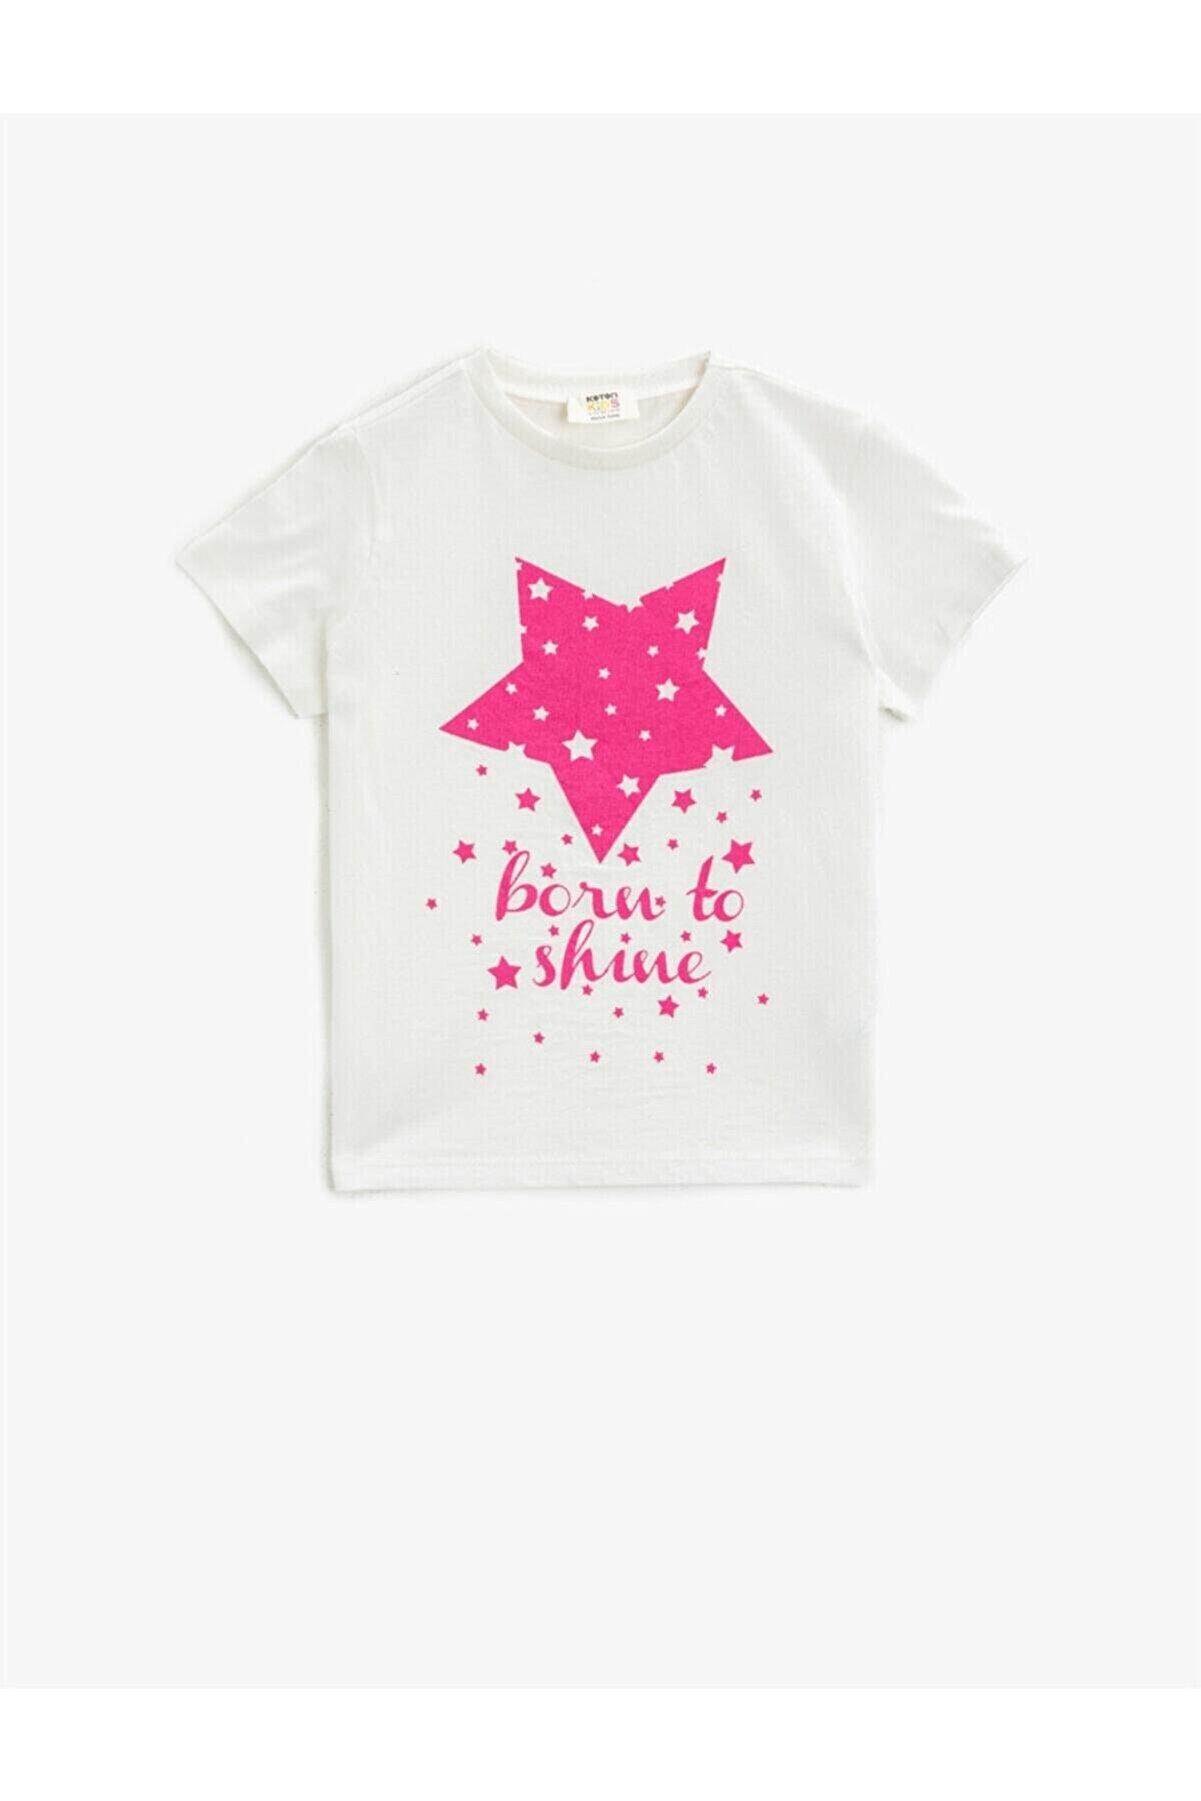 Koton Kız Çocuk Ekru Pamuklu Kısa Kollu Bisiklet Yaka T-Shirt